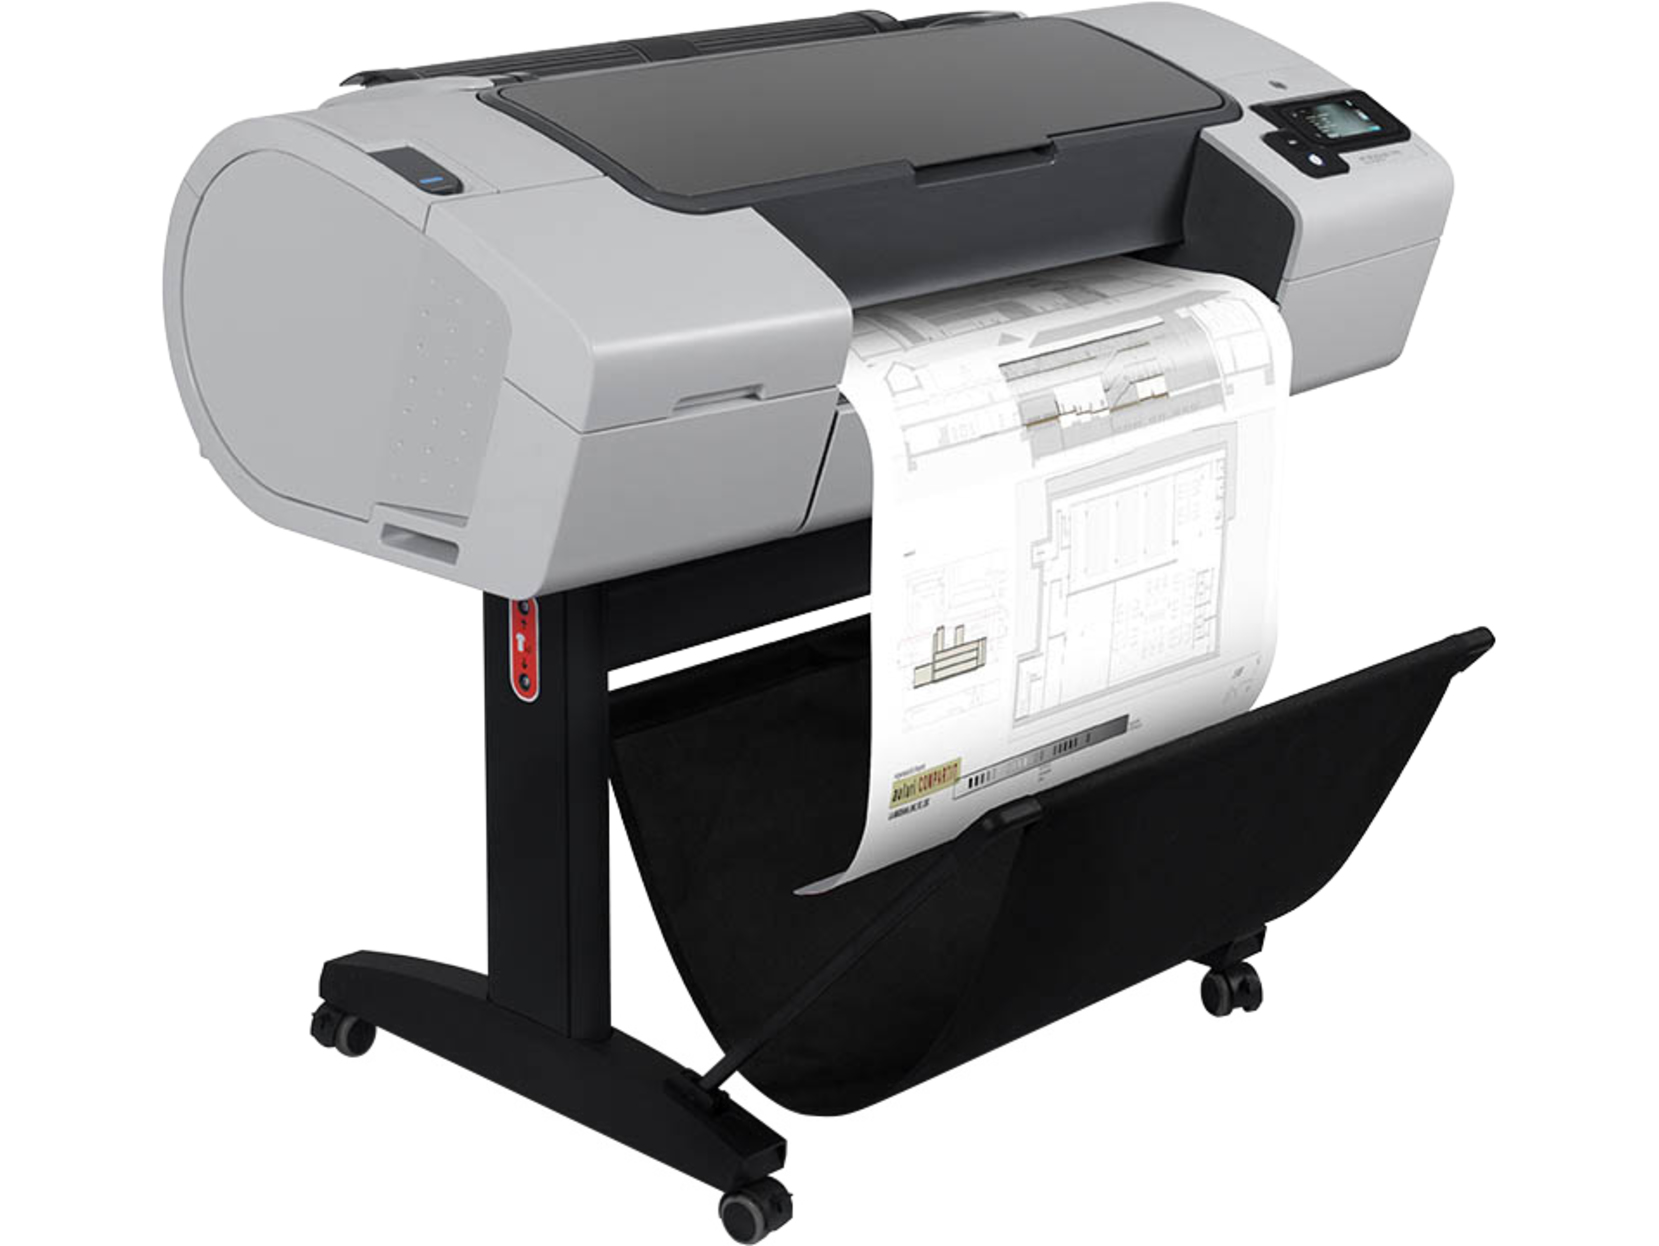 HP Designjet T790 610-mm PostScript Printer